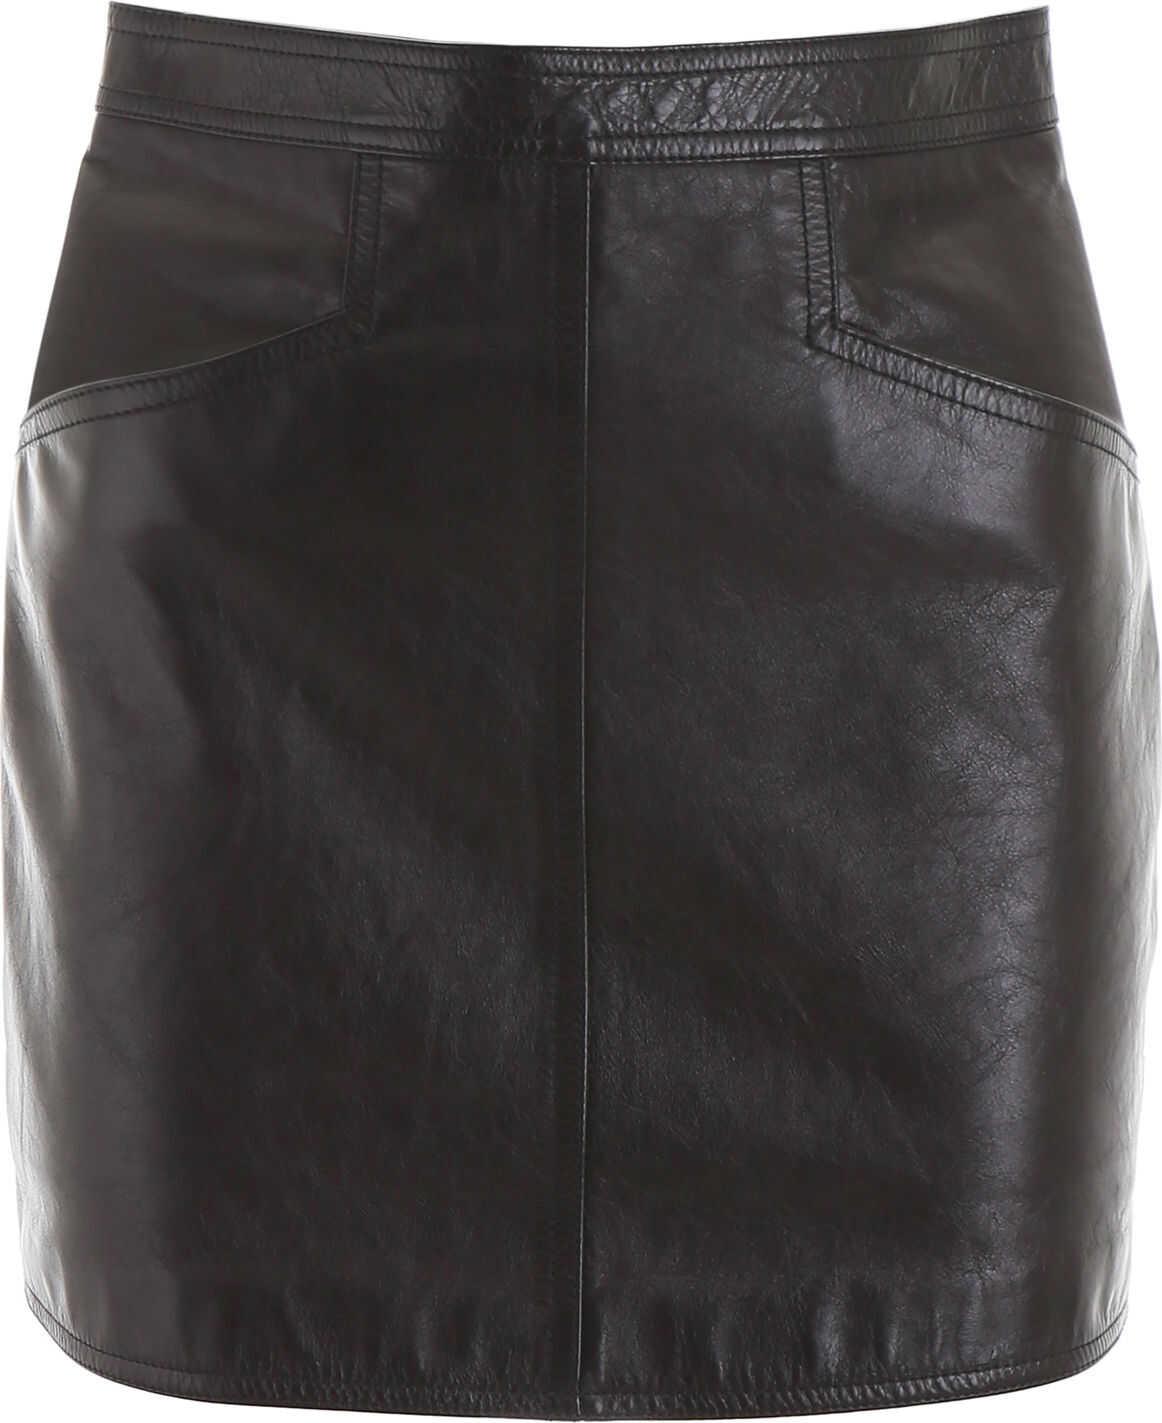 Saint Laurent Leather Mini Skirt NOIR NOIR